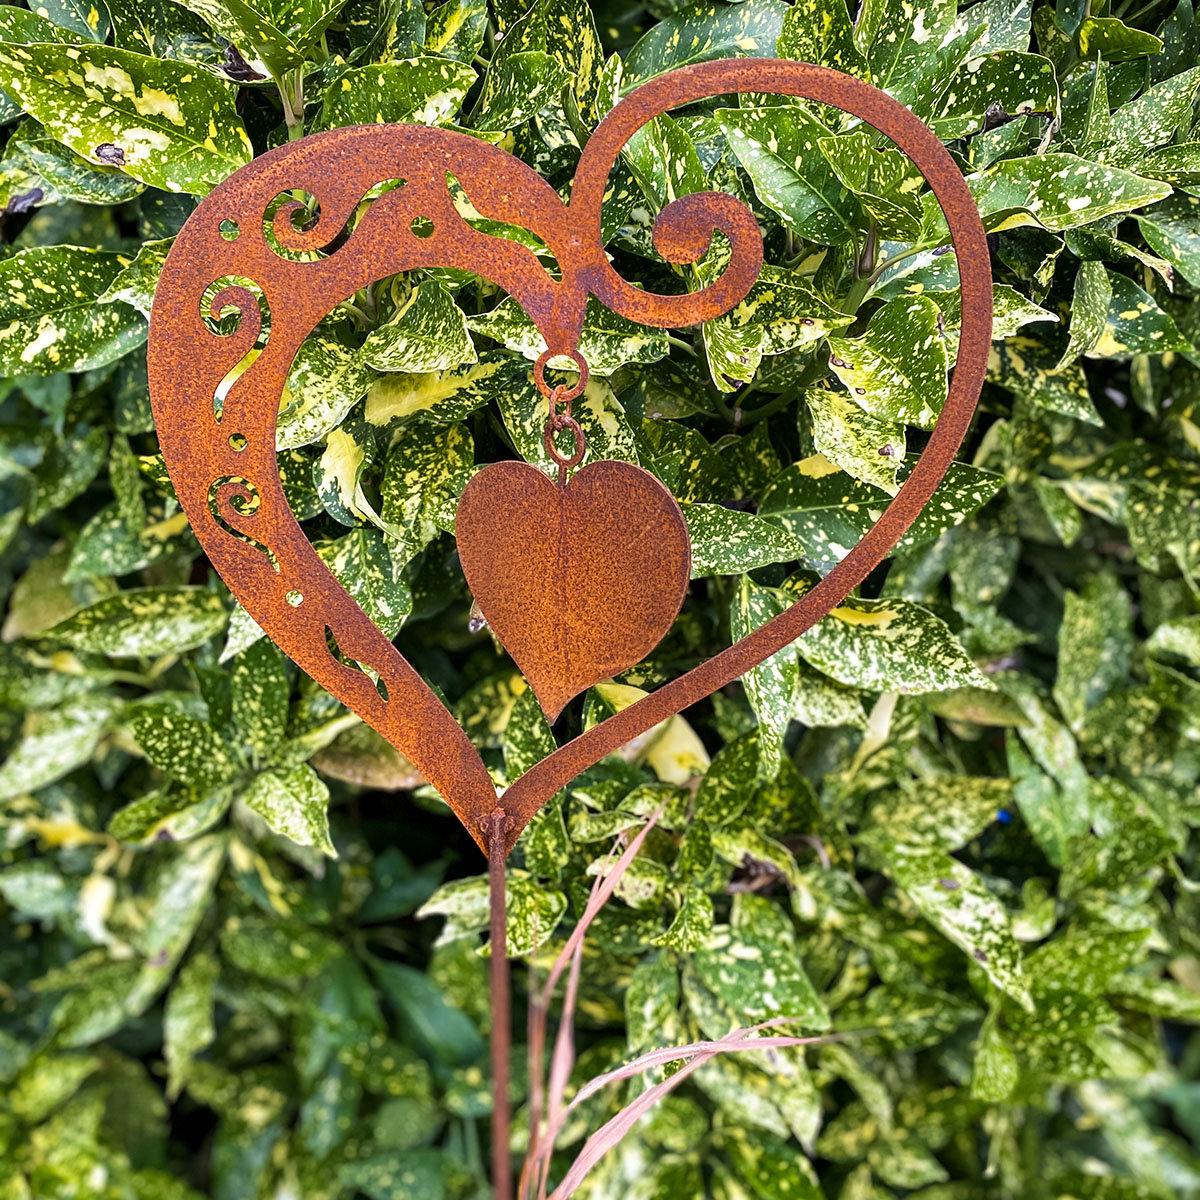 Gartenstecker Herz Sweetheart, Edelrost, ca. 65 cm